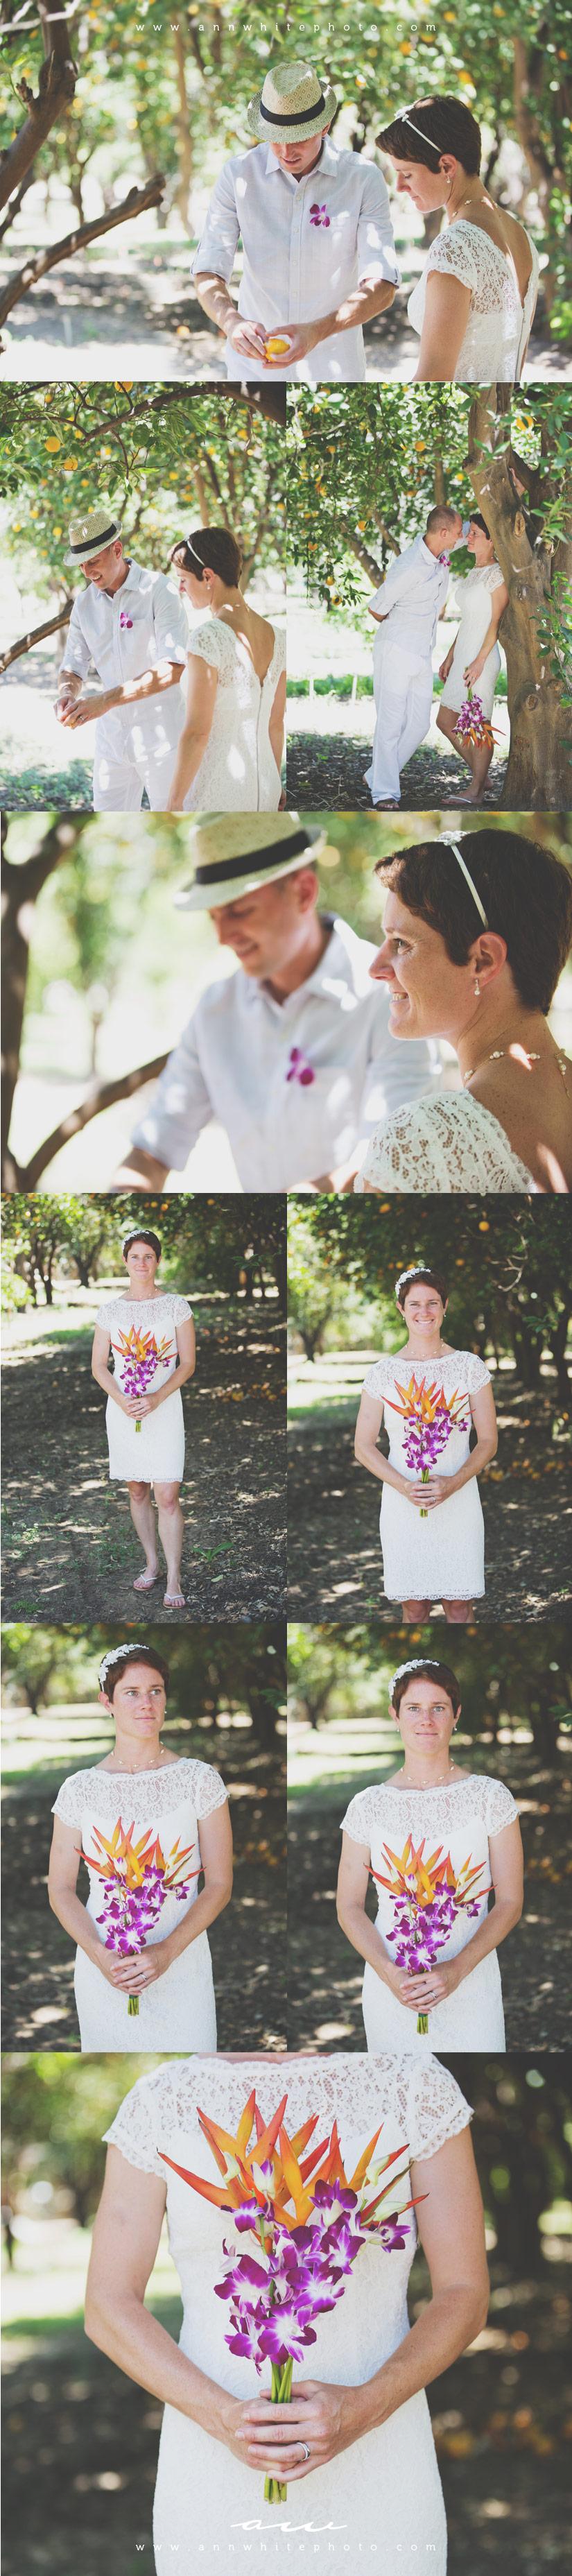 Aubellas_wedding6.jpg